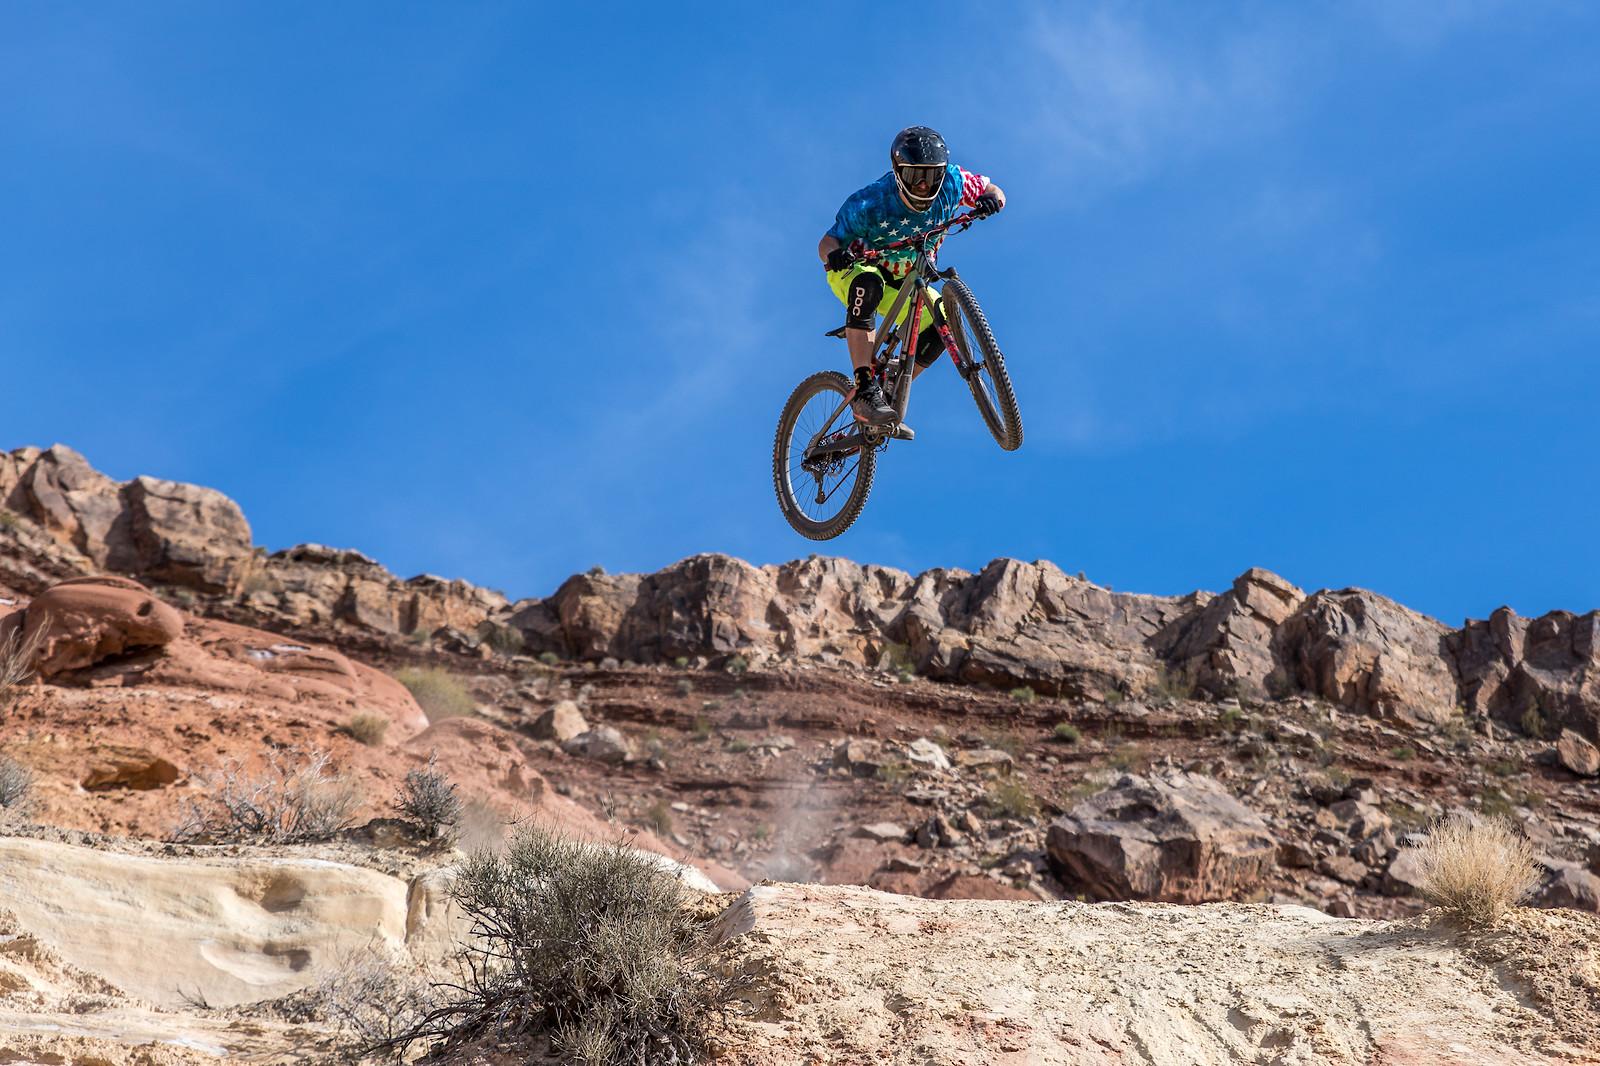 Southern Utah Step-Down Floater - dirtworks911 - Mountain Biking Pictures - Vital MTB